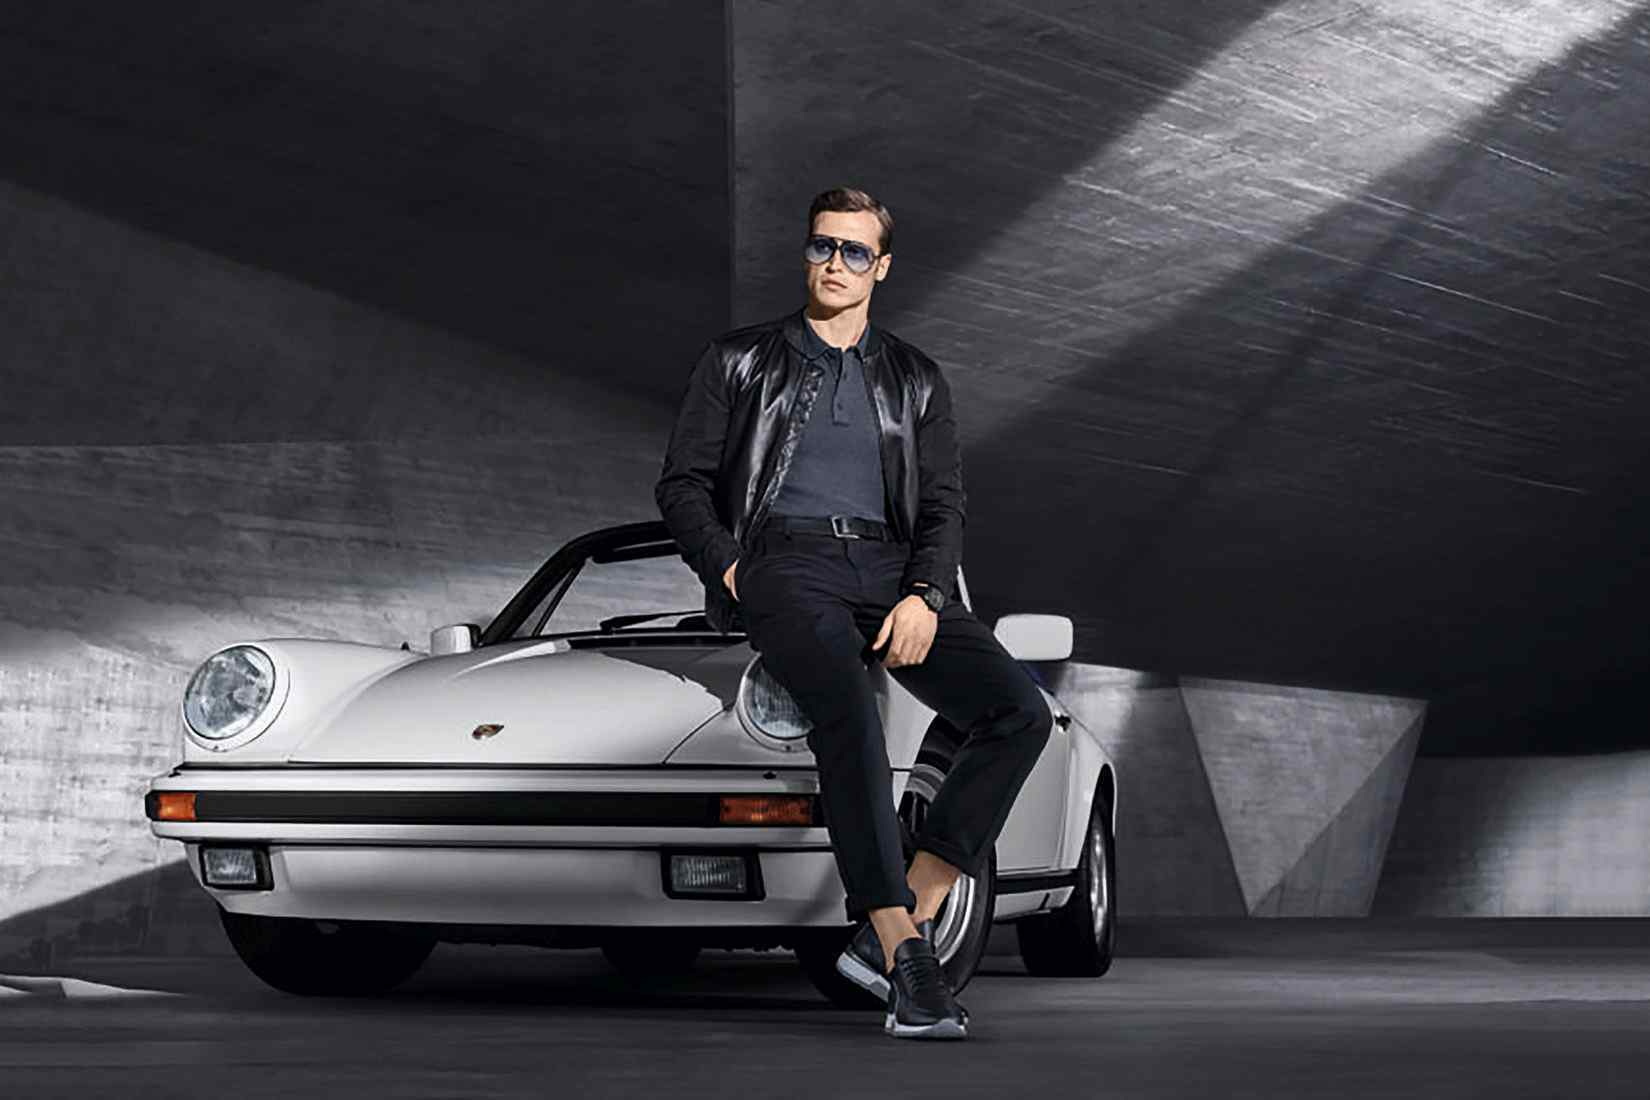 Porsche Design spectacles 17 1650x1100